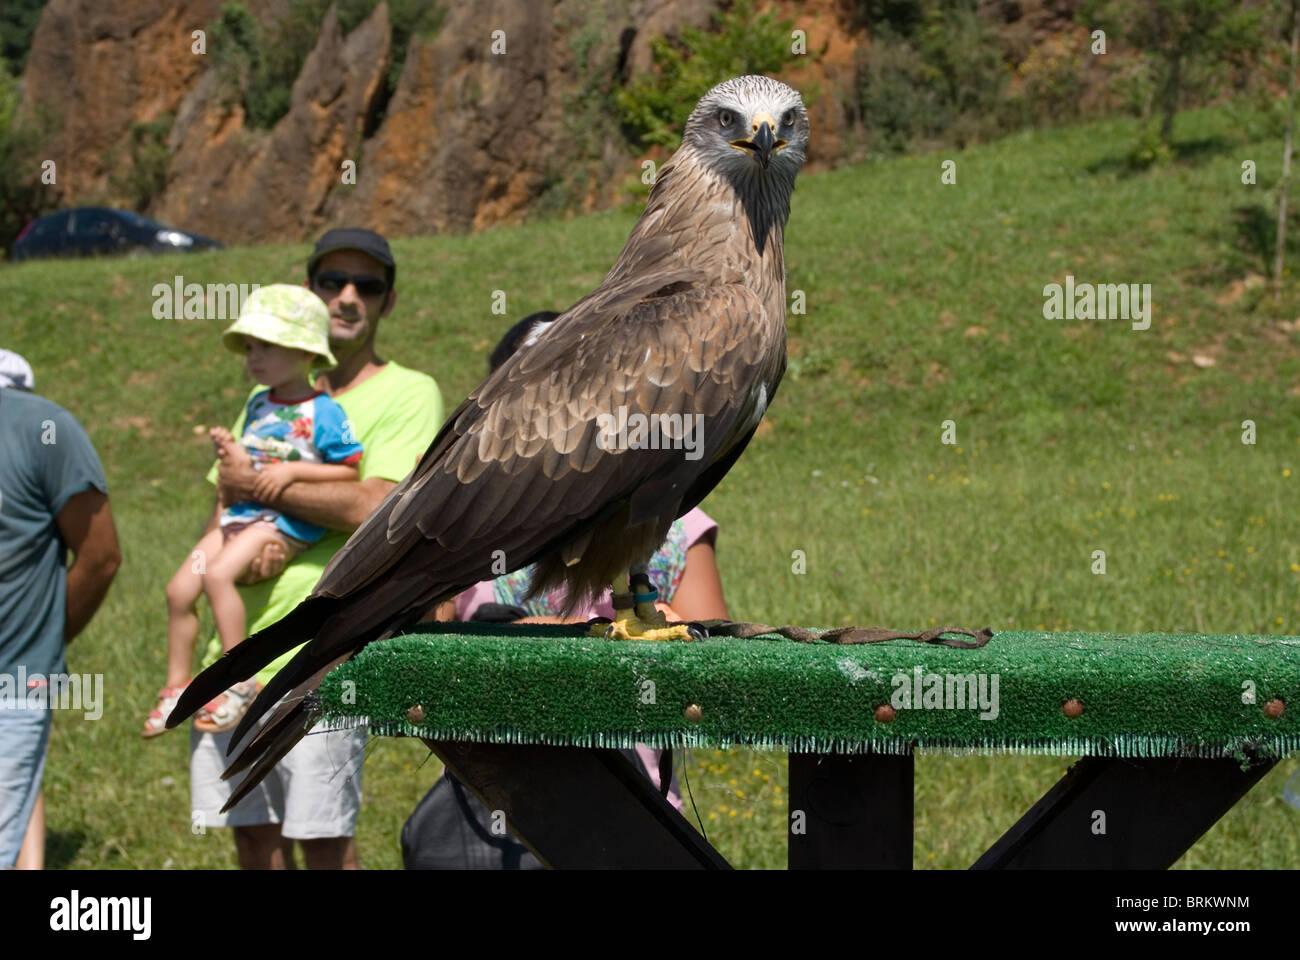 Black Kite (Milvus migrans) at a falconry exhibition. - Stock Image